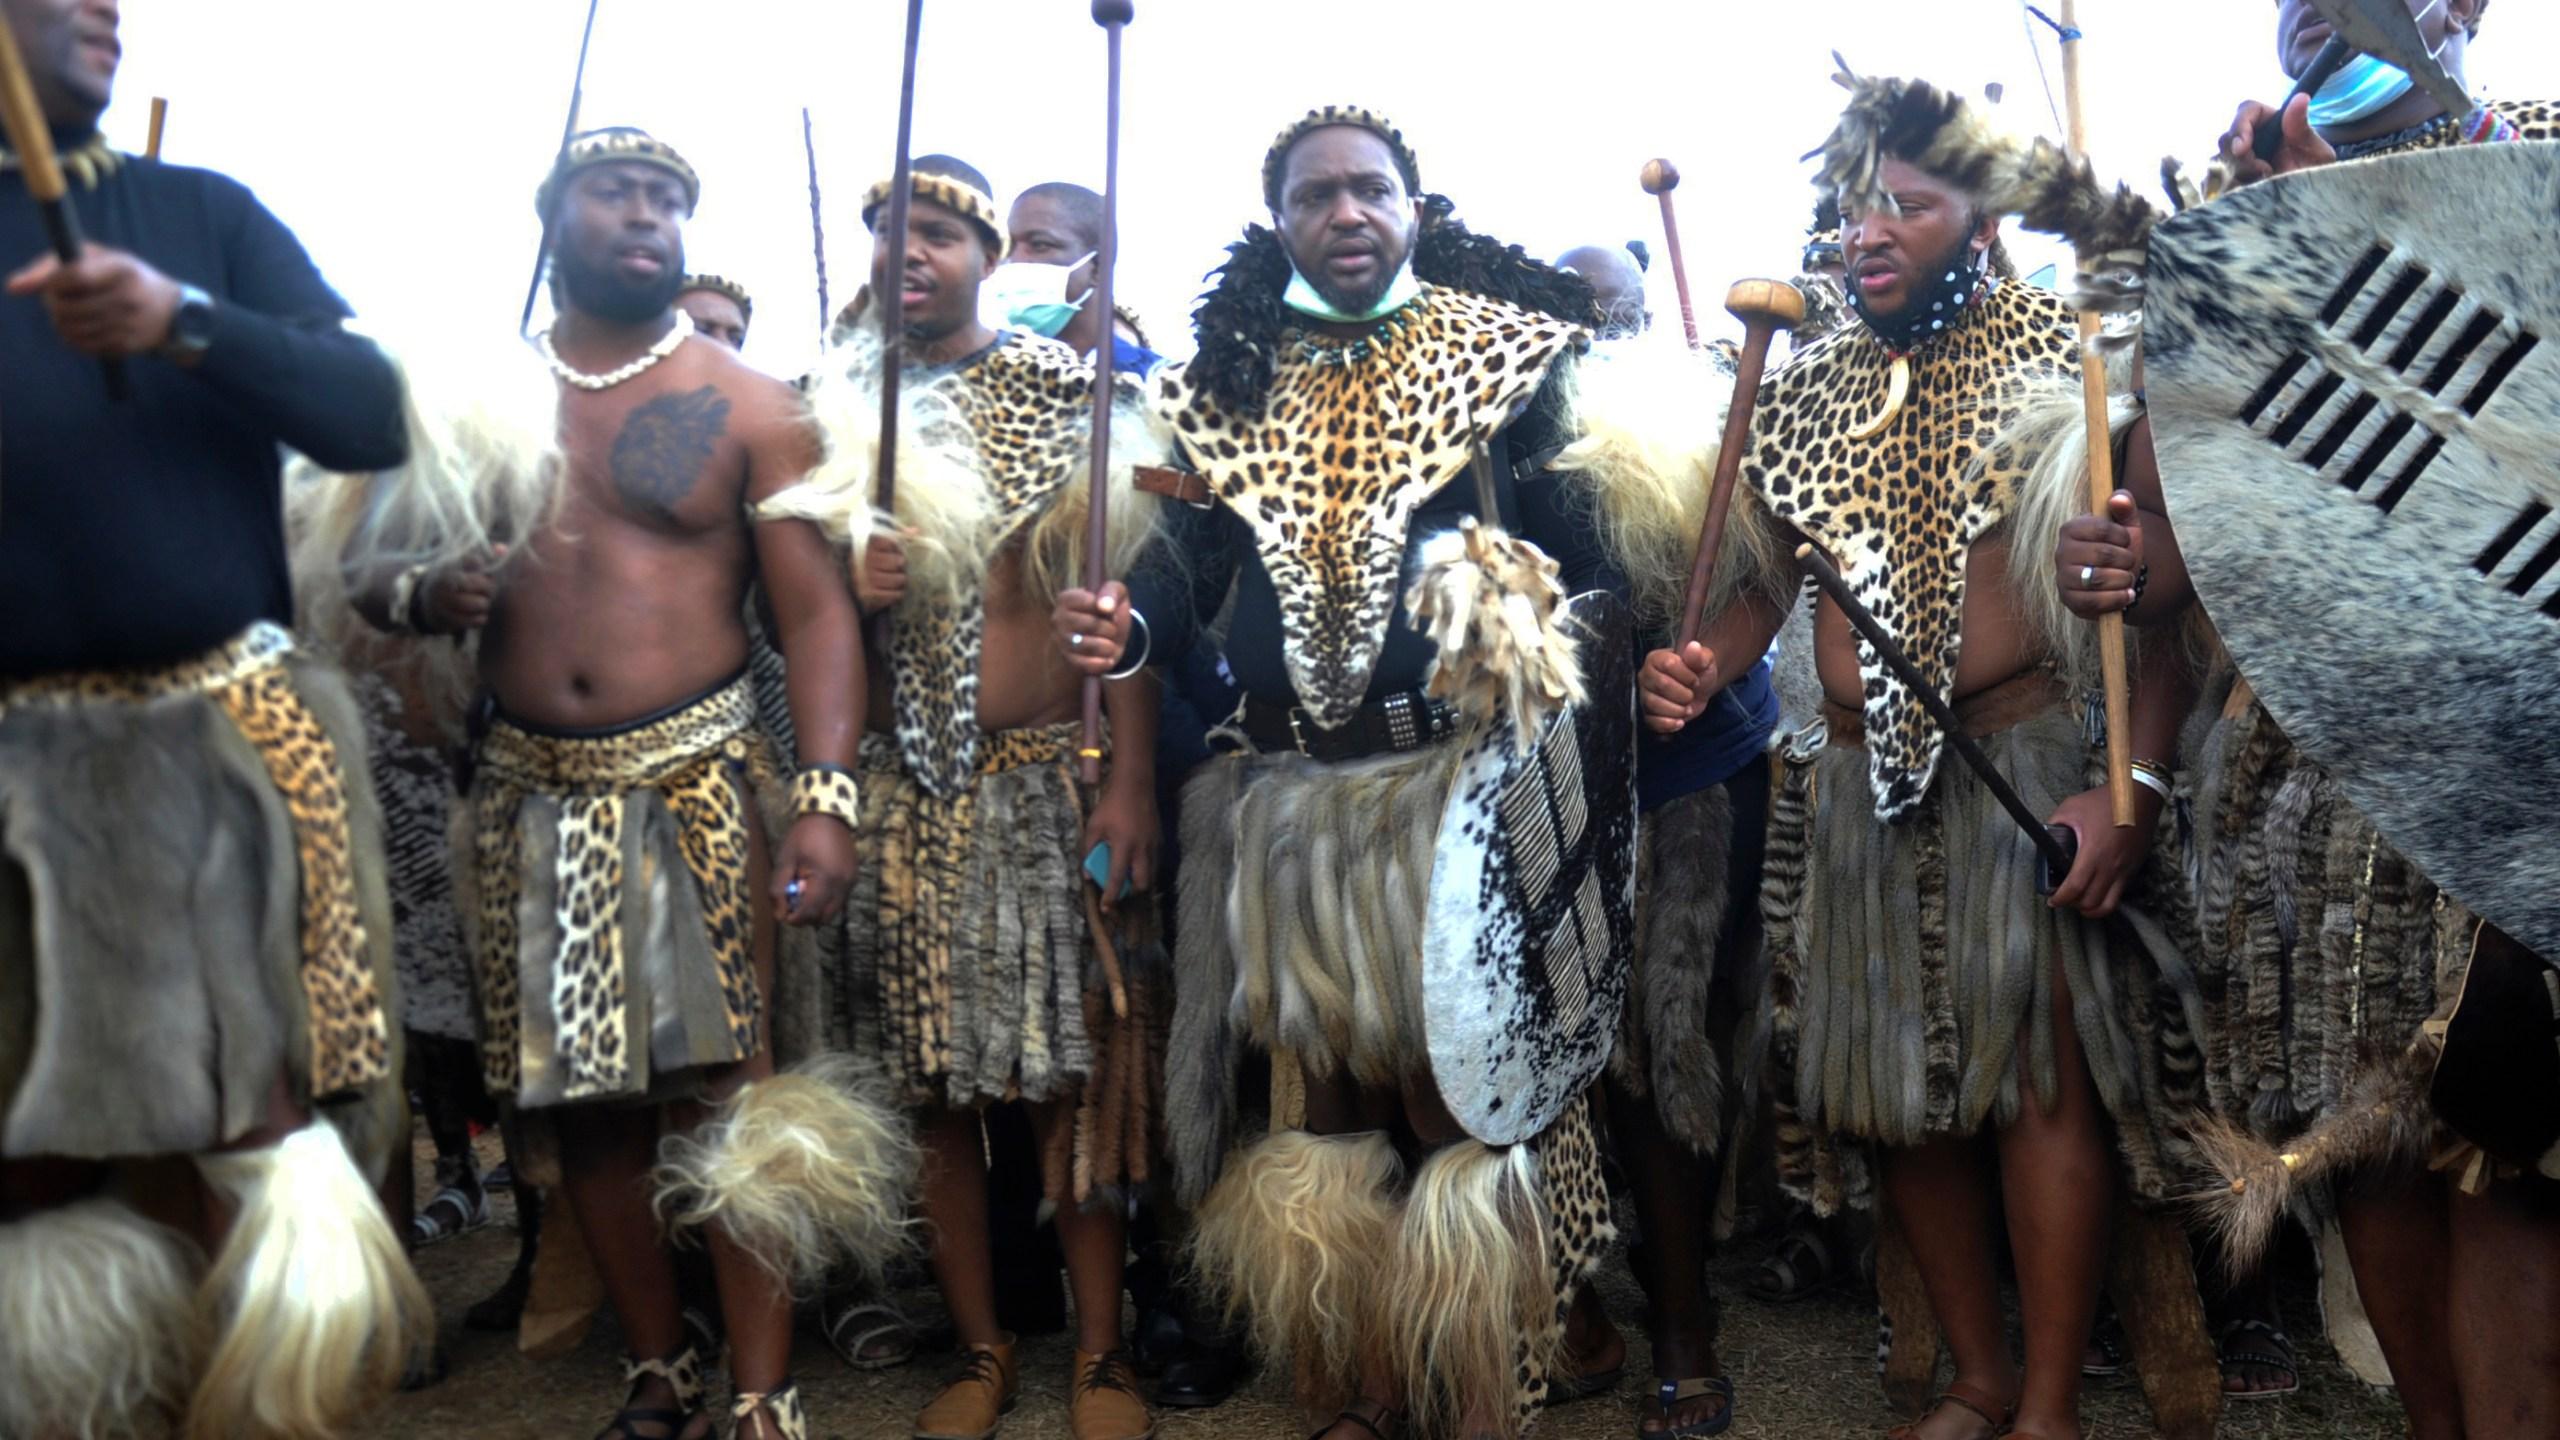 Prince Misuzulu Zulu